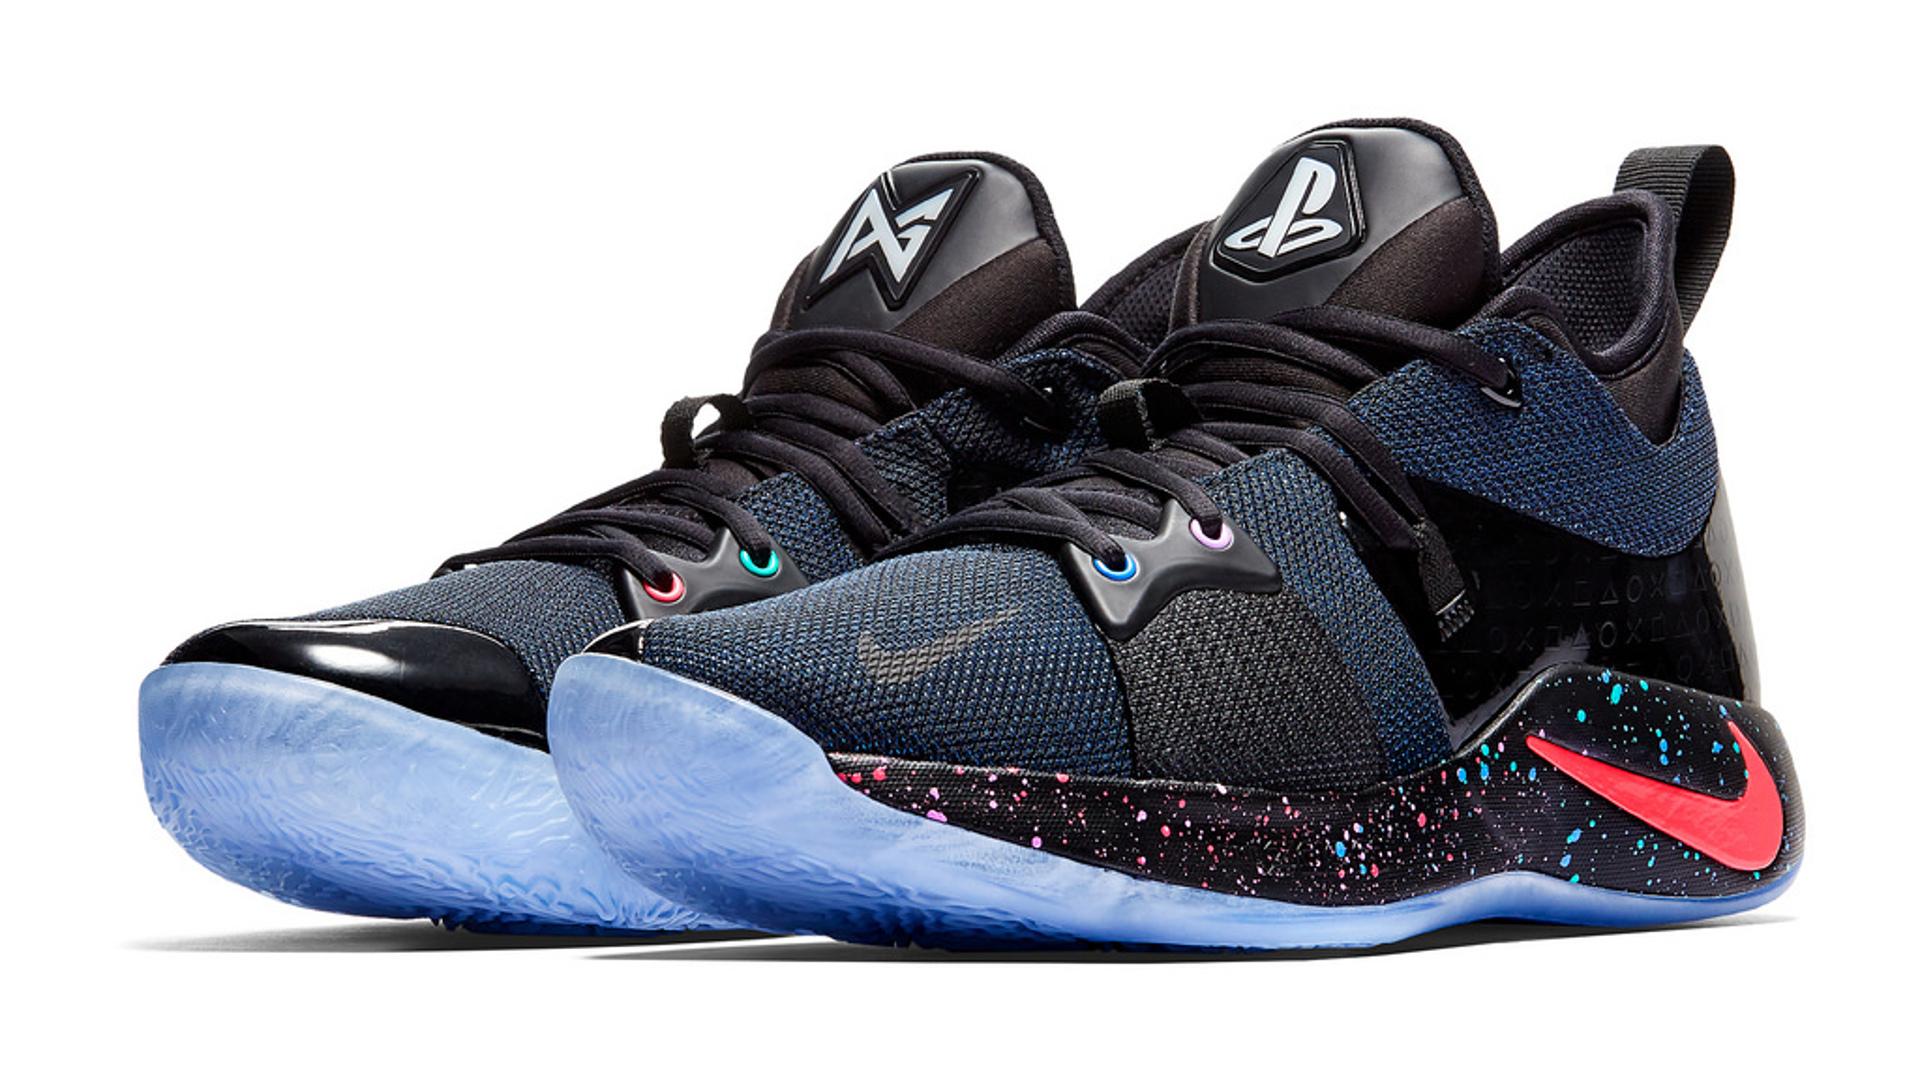 promo code dc9b1 ca968 PlayStation Enttäuschender Launch der offiziellen Nike-Schuh